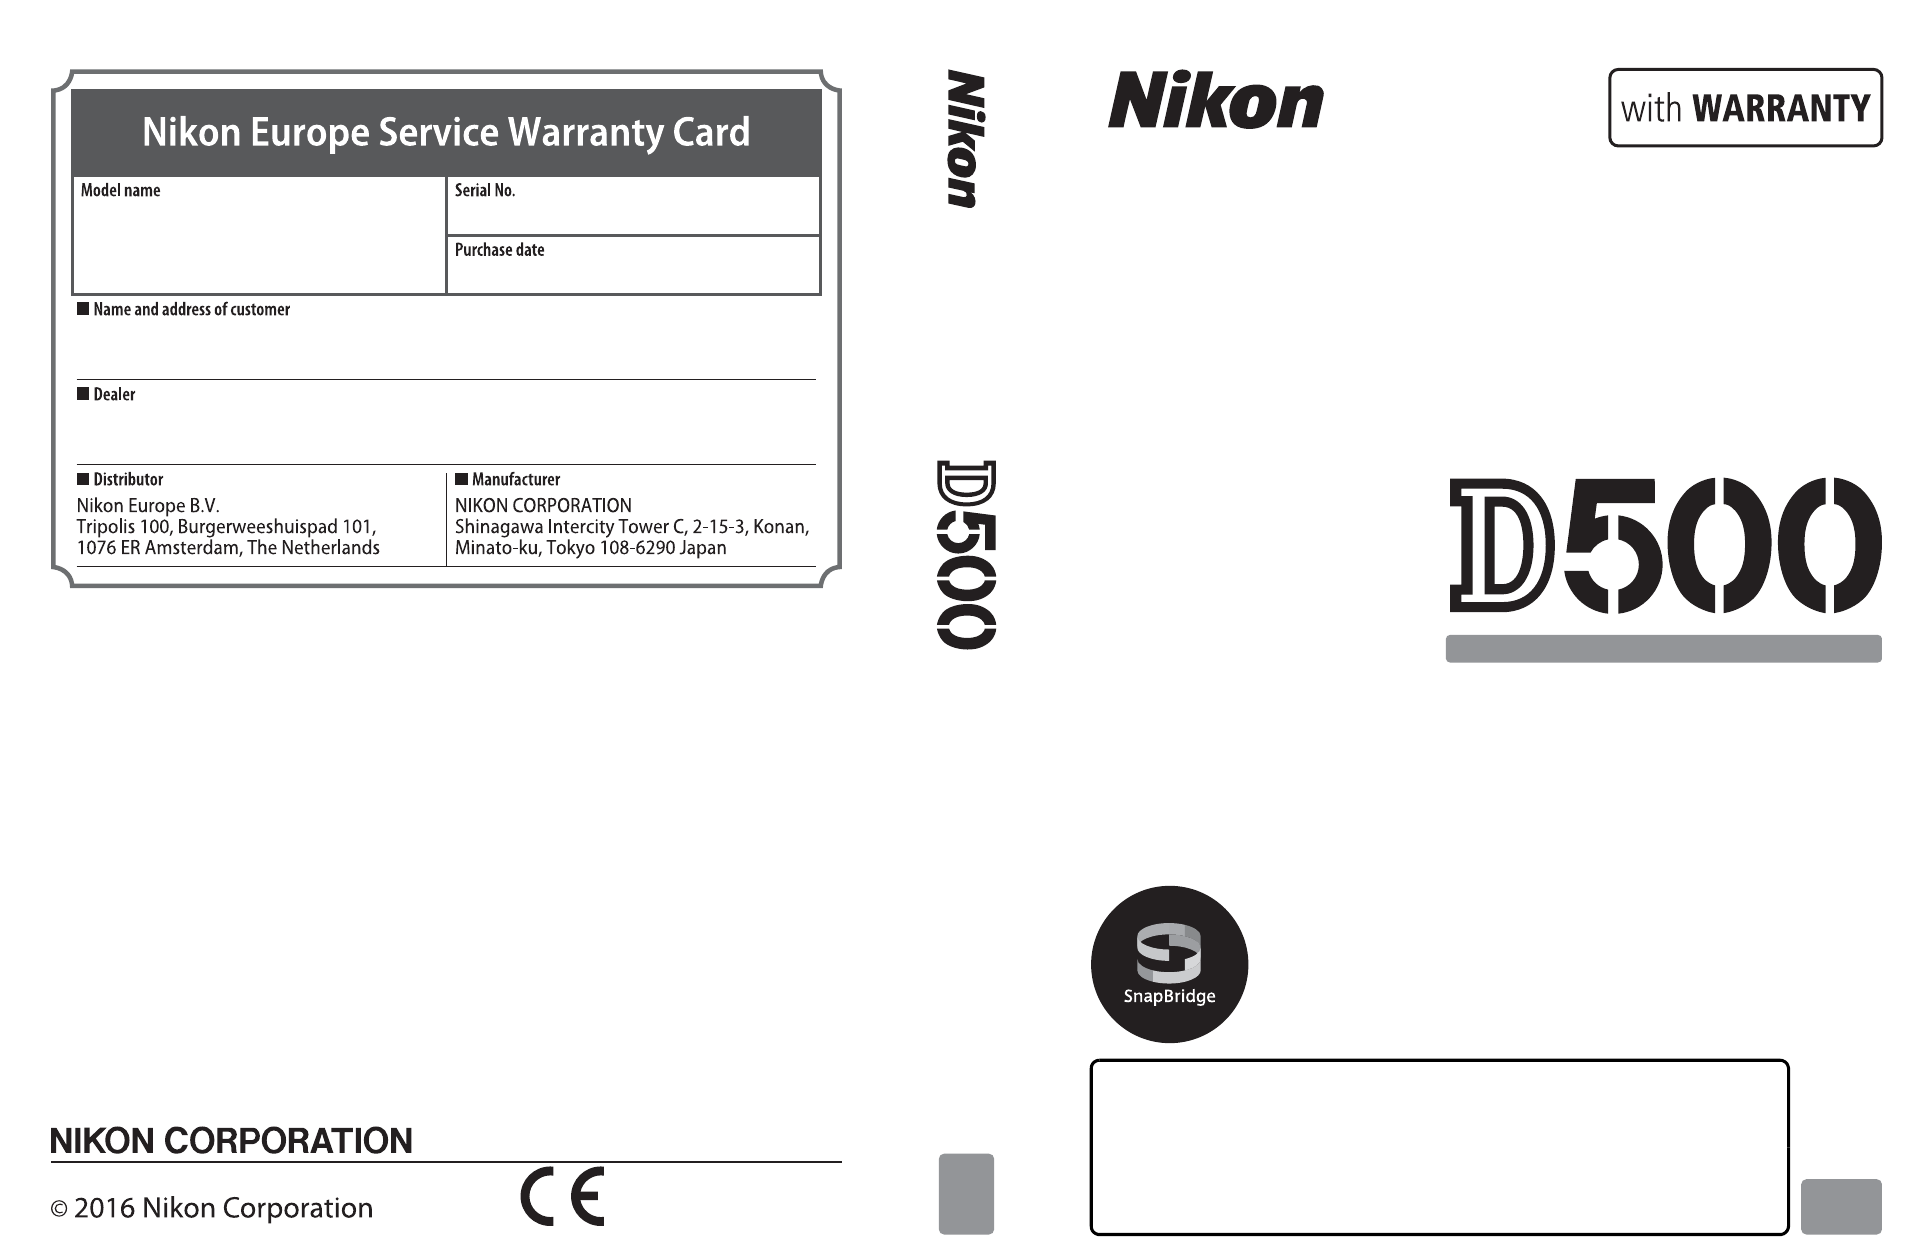 nikon d500 user manual 432 pages rh manualsdir com nikon d500 manual english nikon d500 manuale italiano